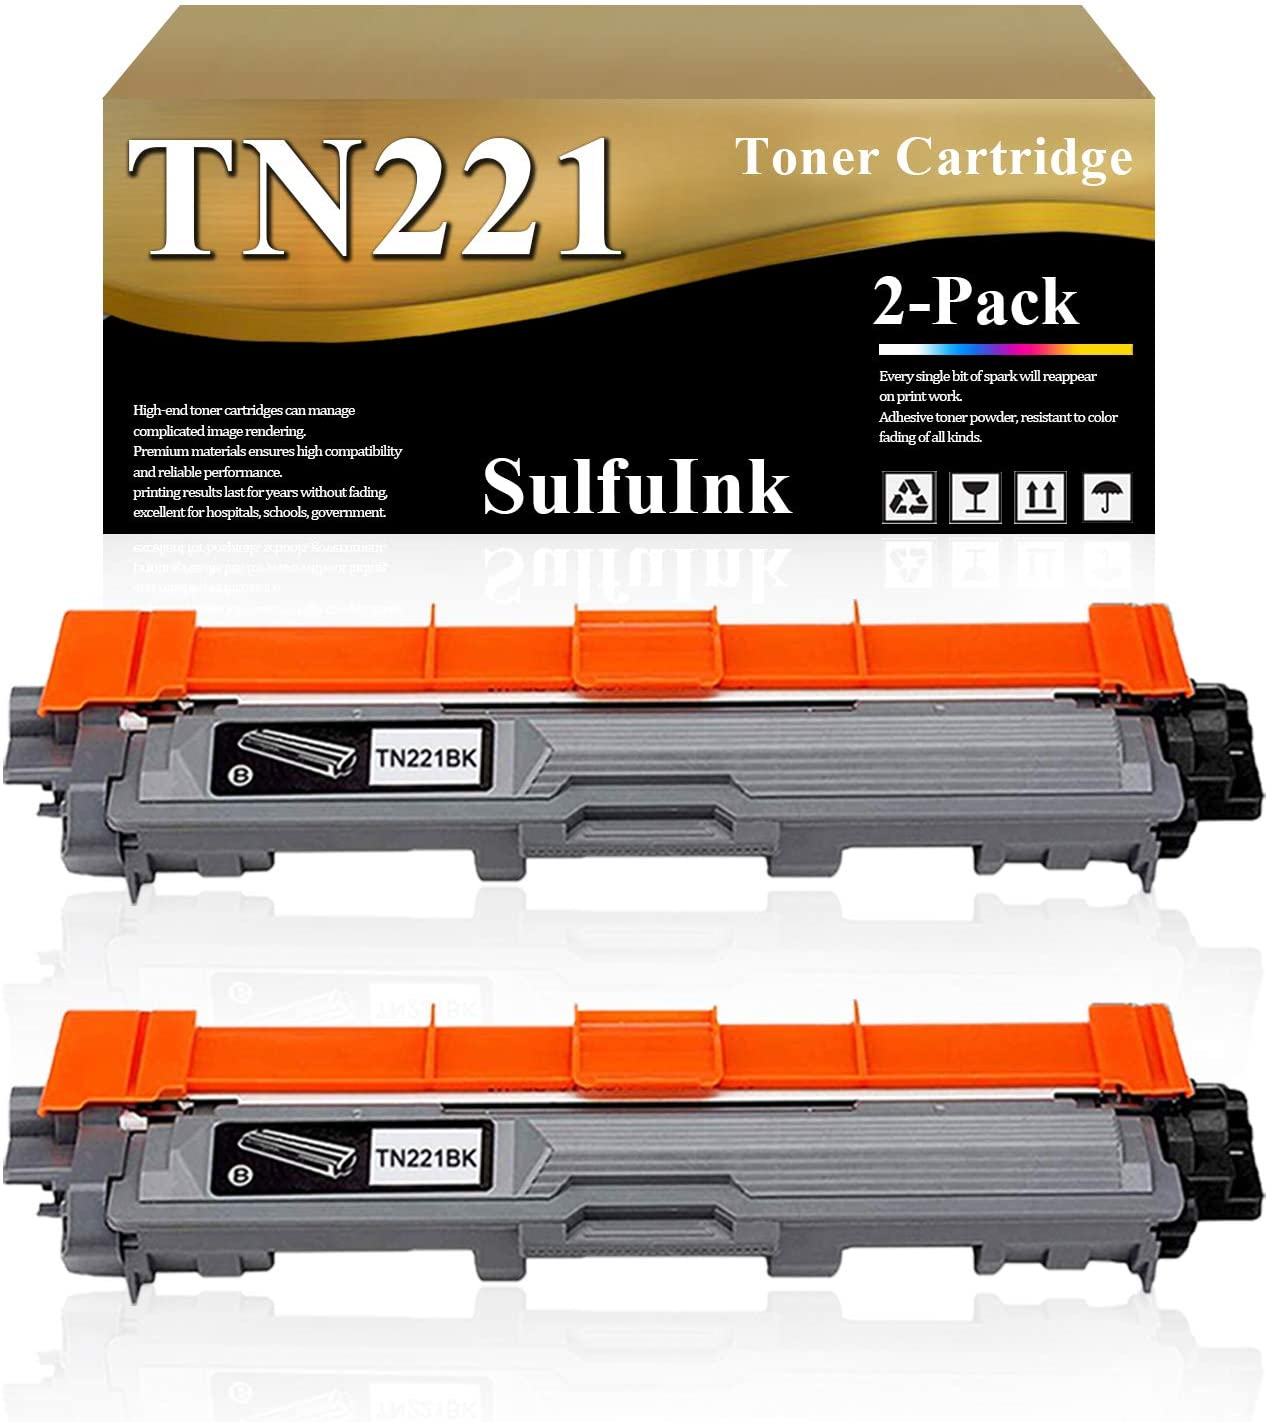 Compatible TN221 Toner Cartridge (Black, 2-Pack) Replacement for Brother HL 3140CW 3170CDW 3150CDN 3180CDW DCP 9015CDW 9020CDN MFC 9140CDN 9130CW 9330CDW 9340CDW Laser Printer.